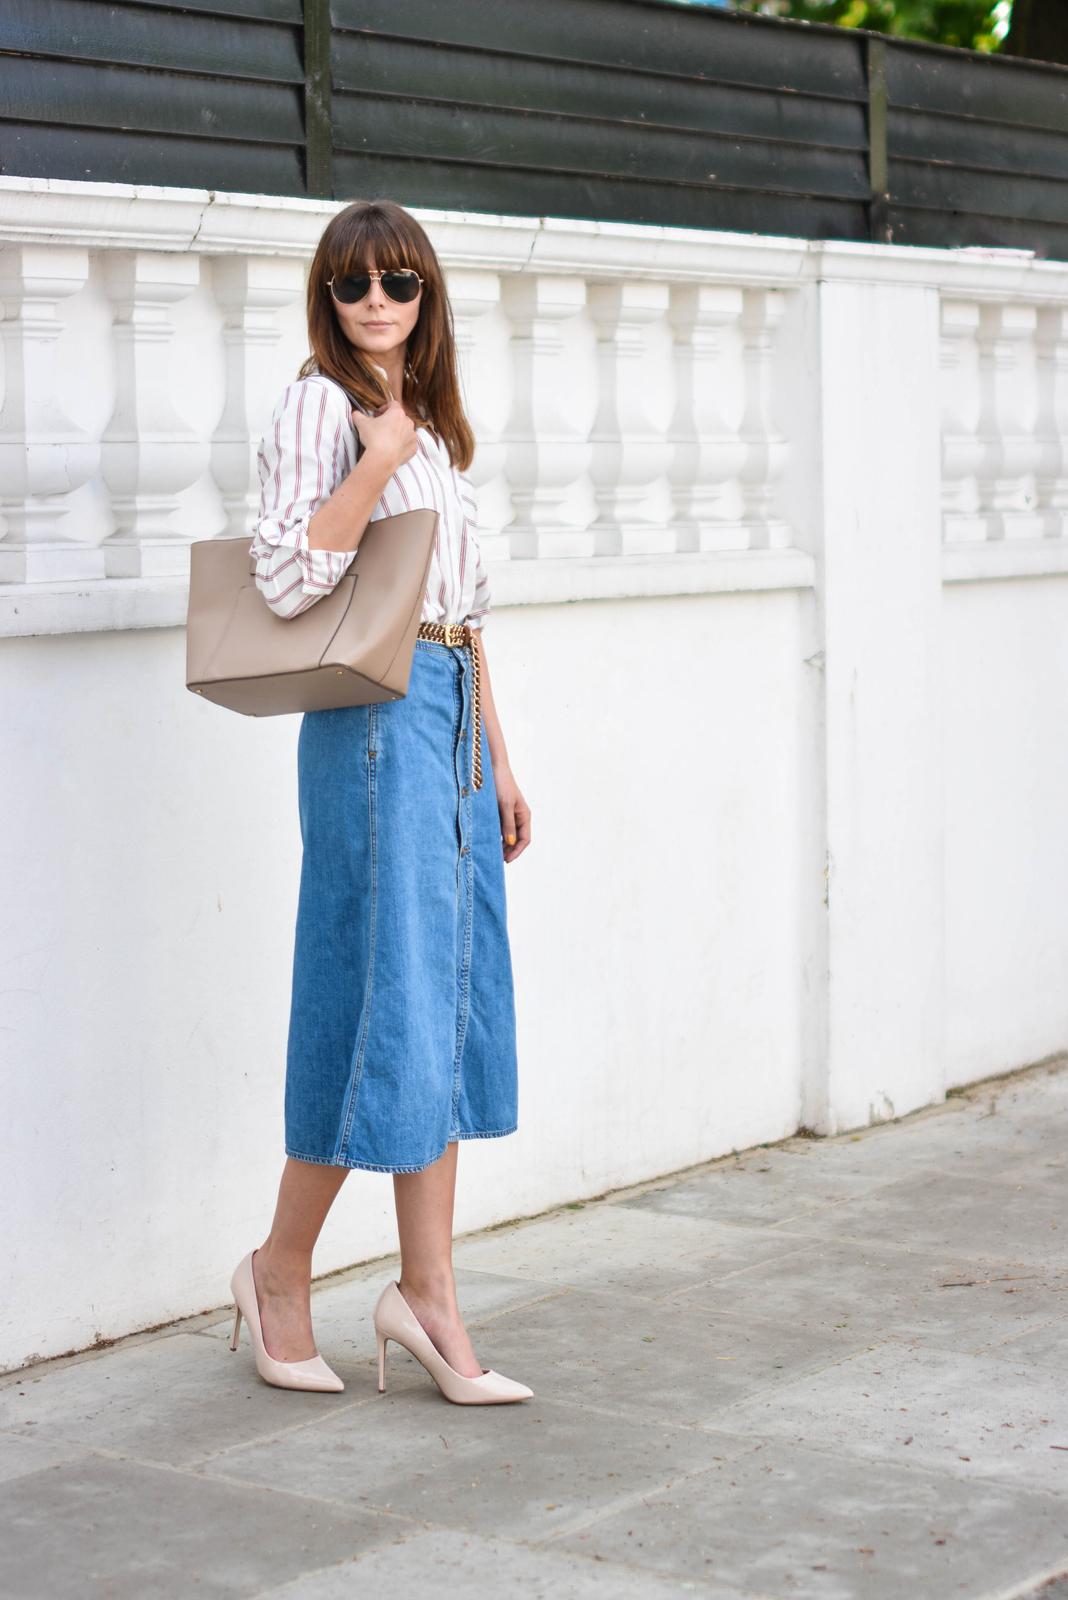 EJSTYLE - Emma Hill wears Zara denim a line button midi skirt, Zara 70s stripe shirt, Nude pointed court shoes, Mango beige tote bag, tan suede gold chain belt